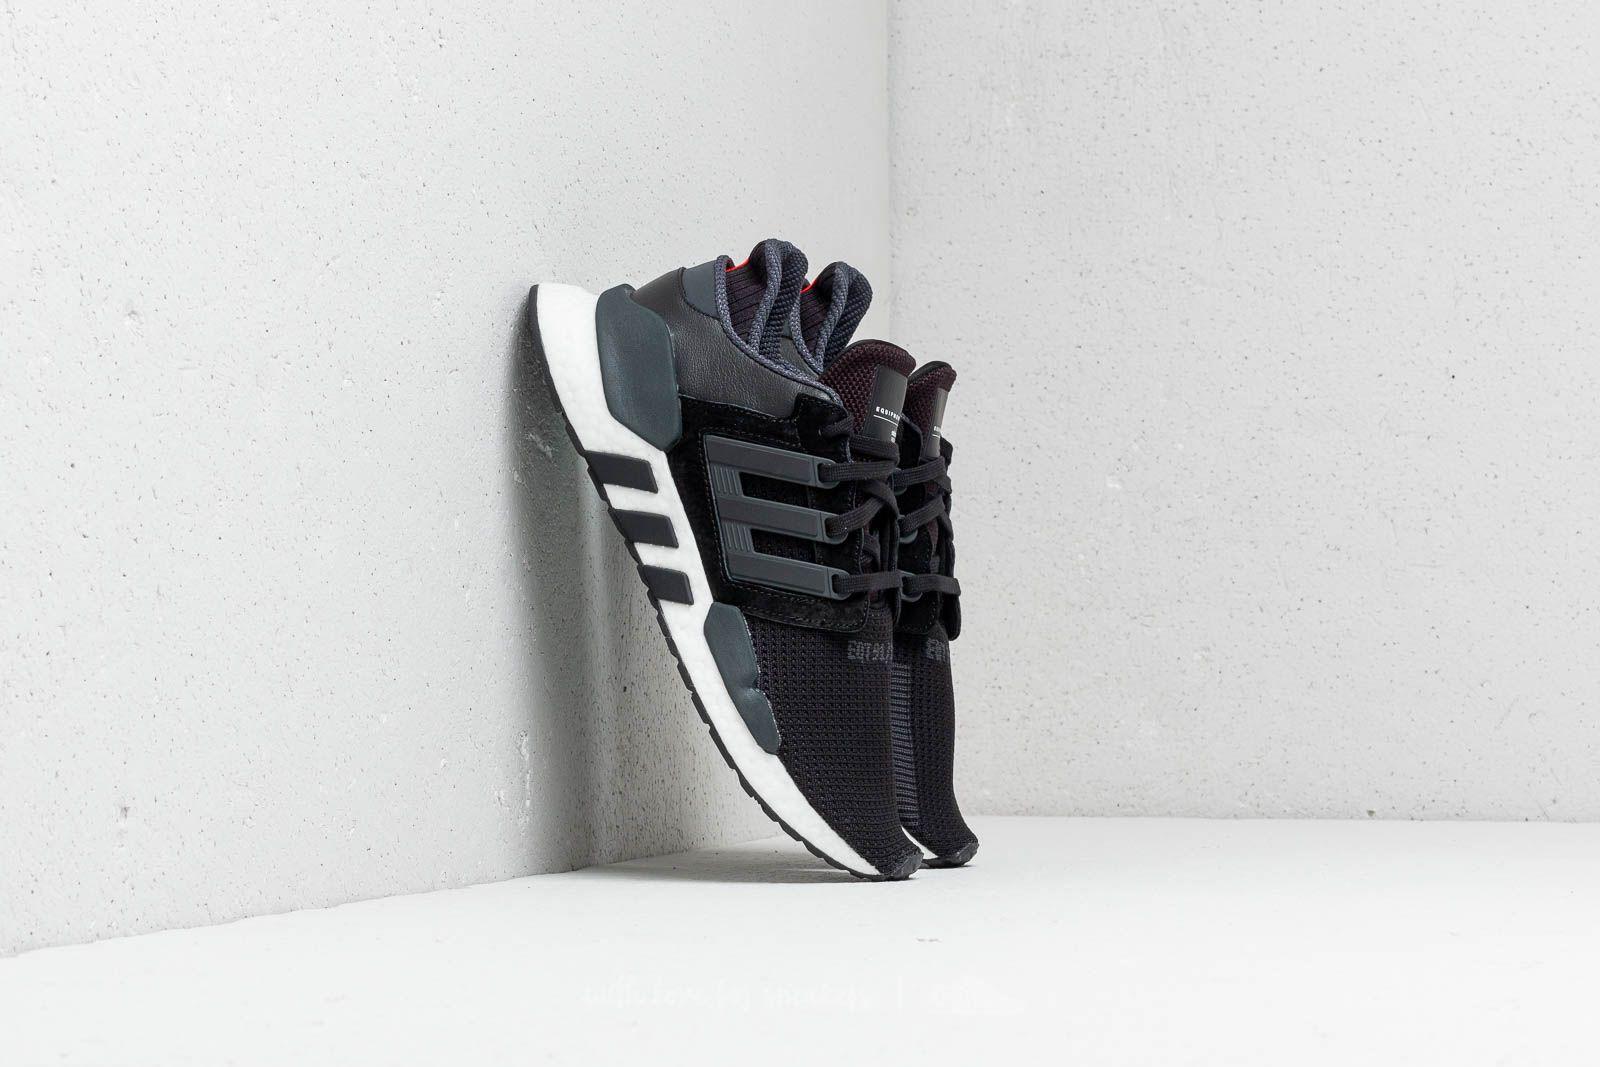 adidas EQT Support 91/18 Core Black/ Core Black/ Ftw White za skvělou cenu 3 210 Kč koupíte na Footshop.cz